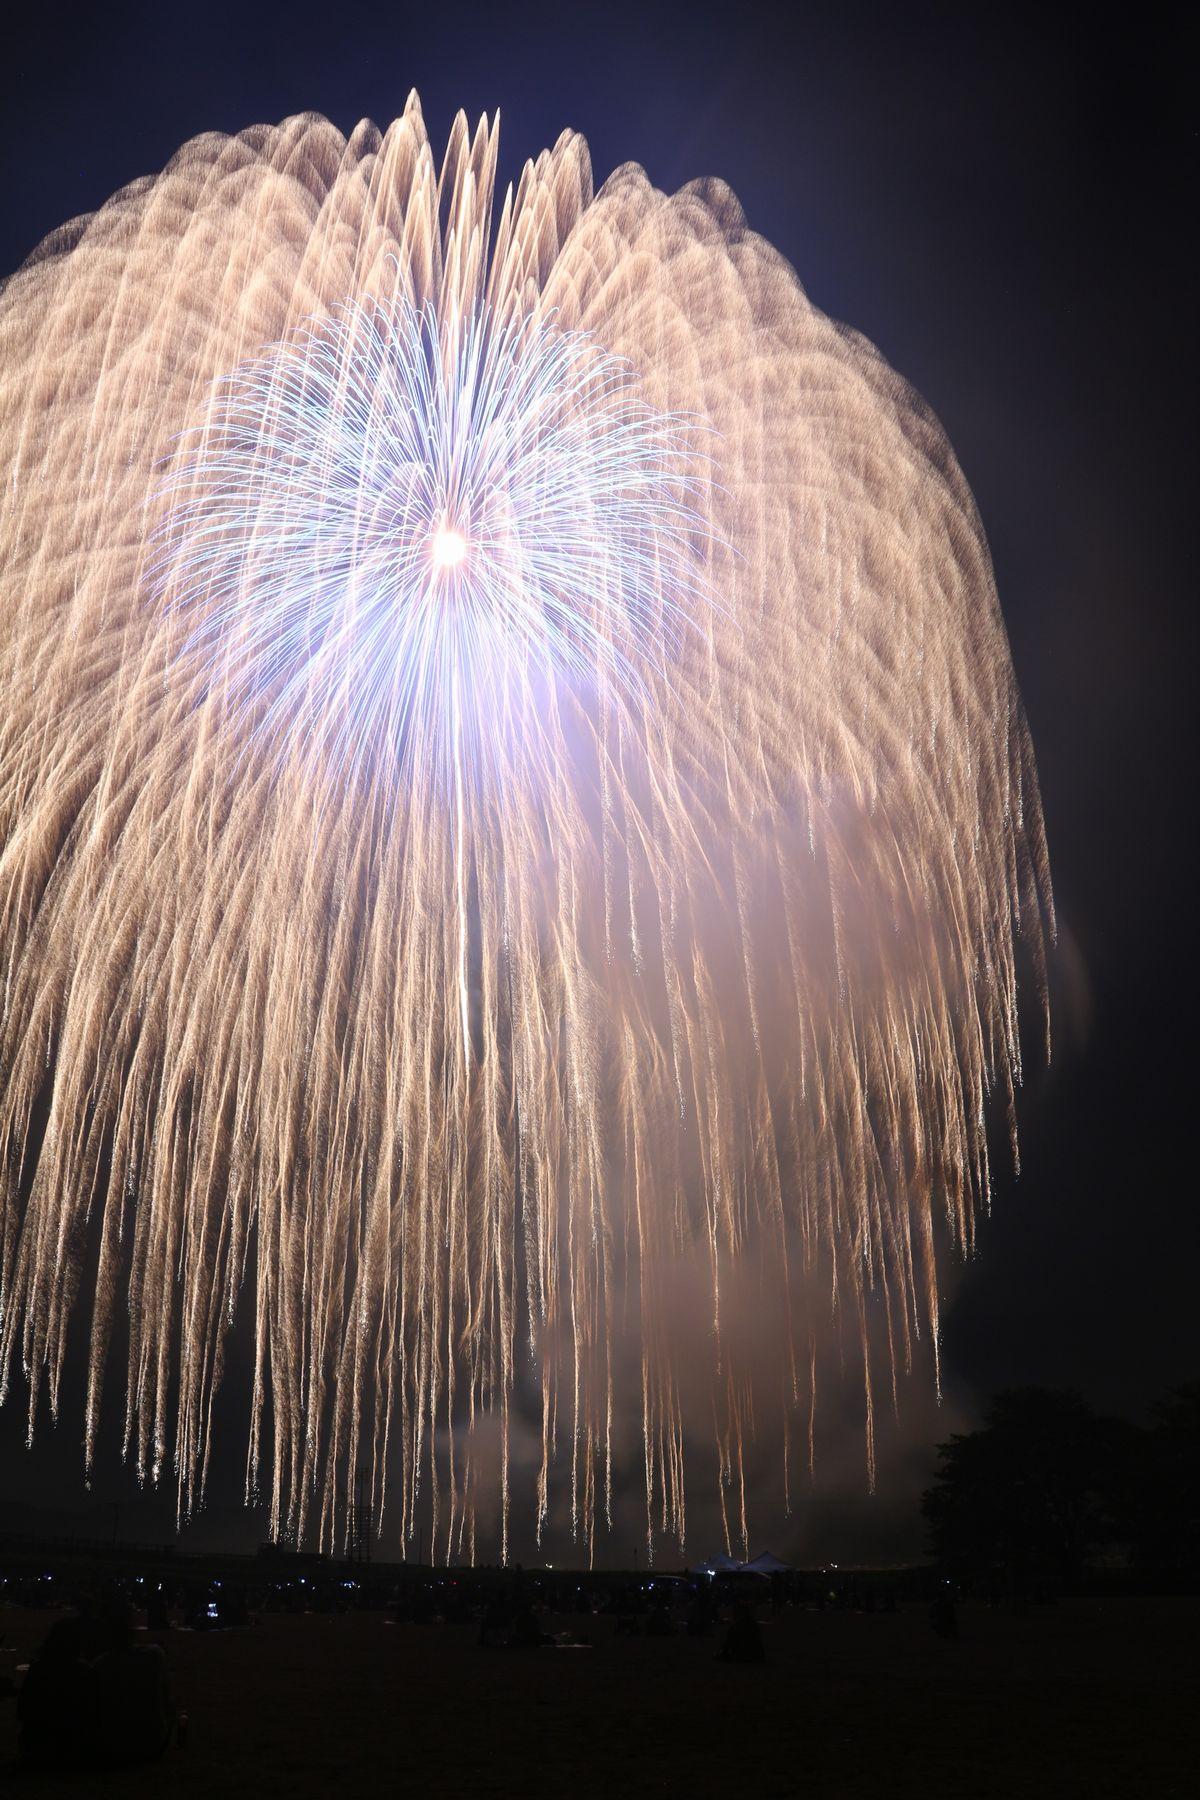 http://www.town.asakawa.fukushima.jp/blog-files/hanabi%20%2829%29.JPG